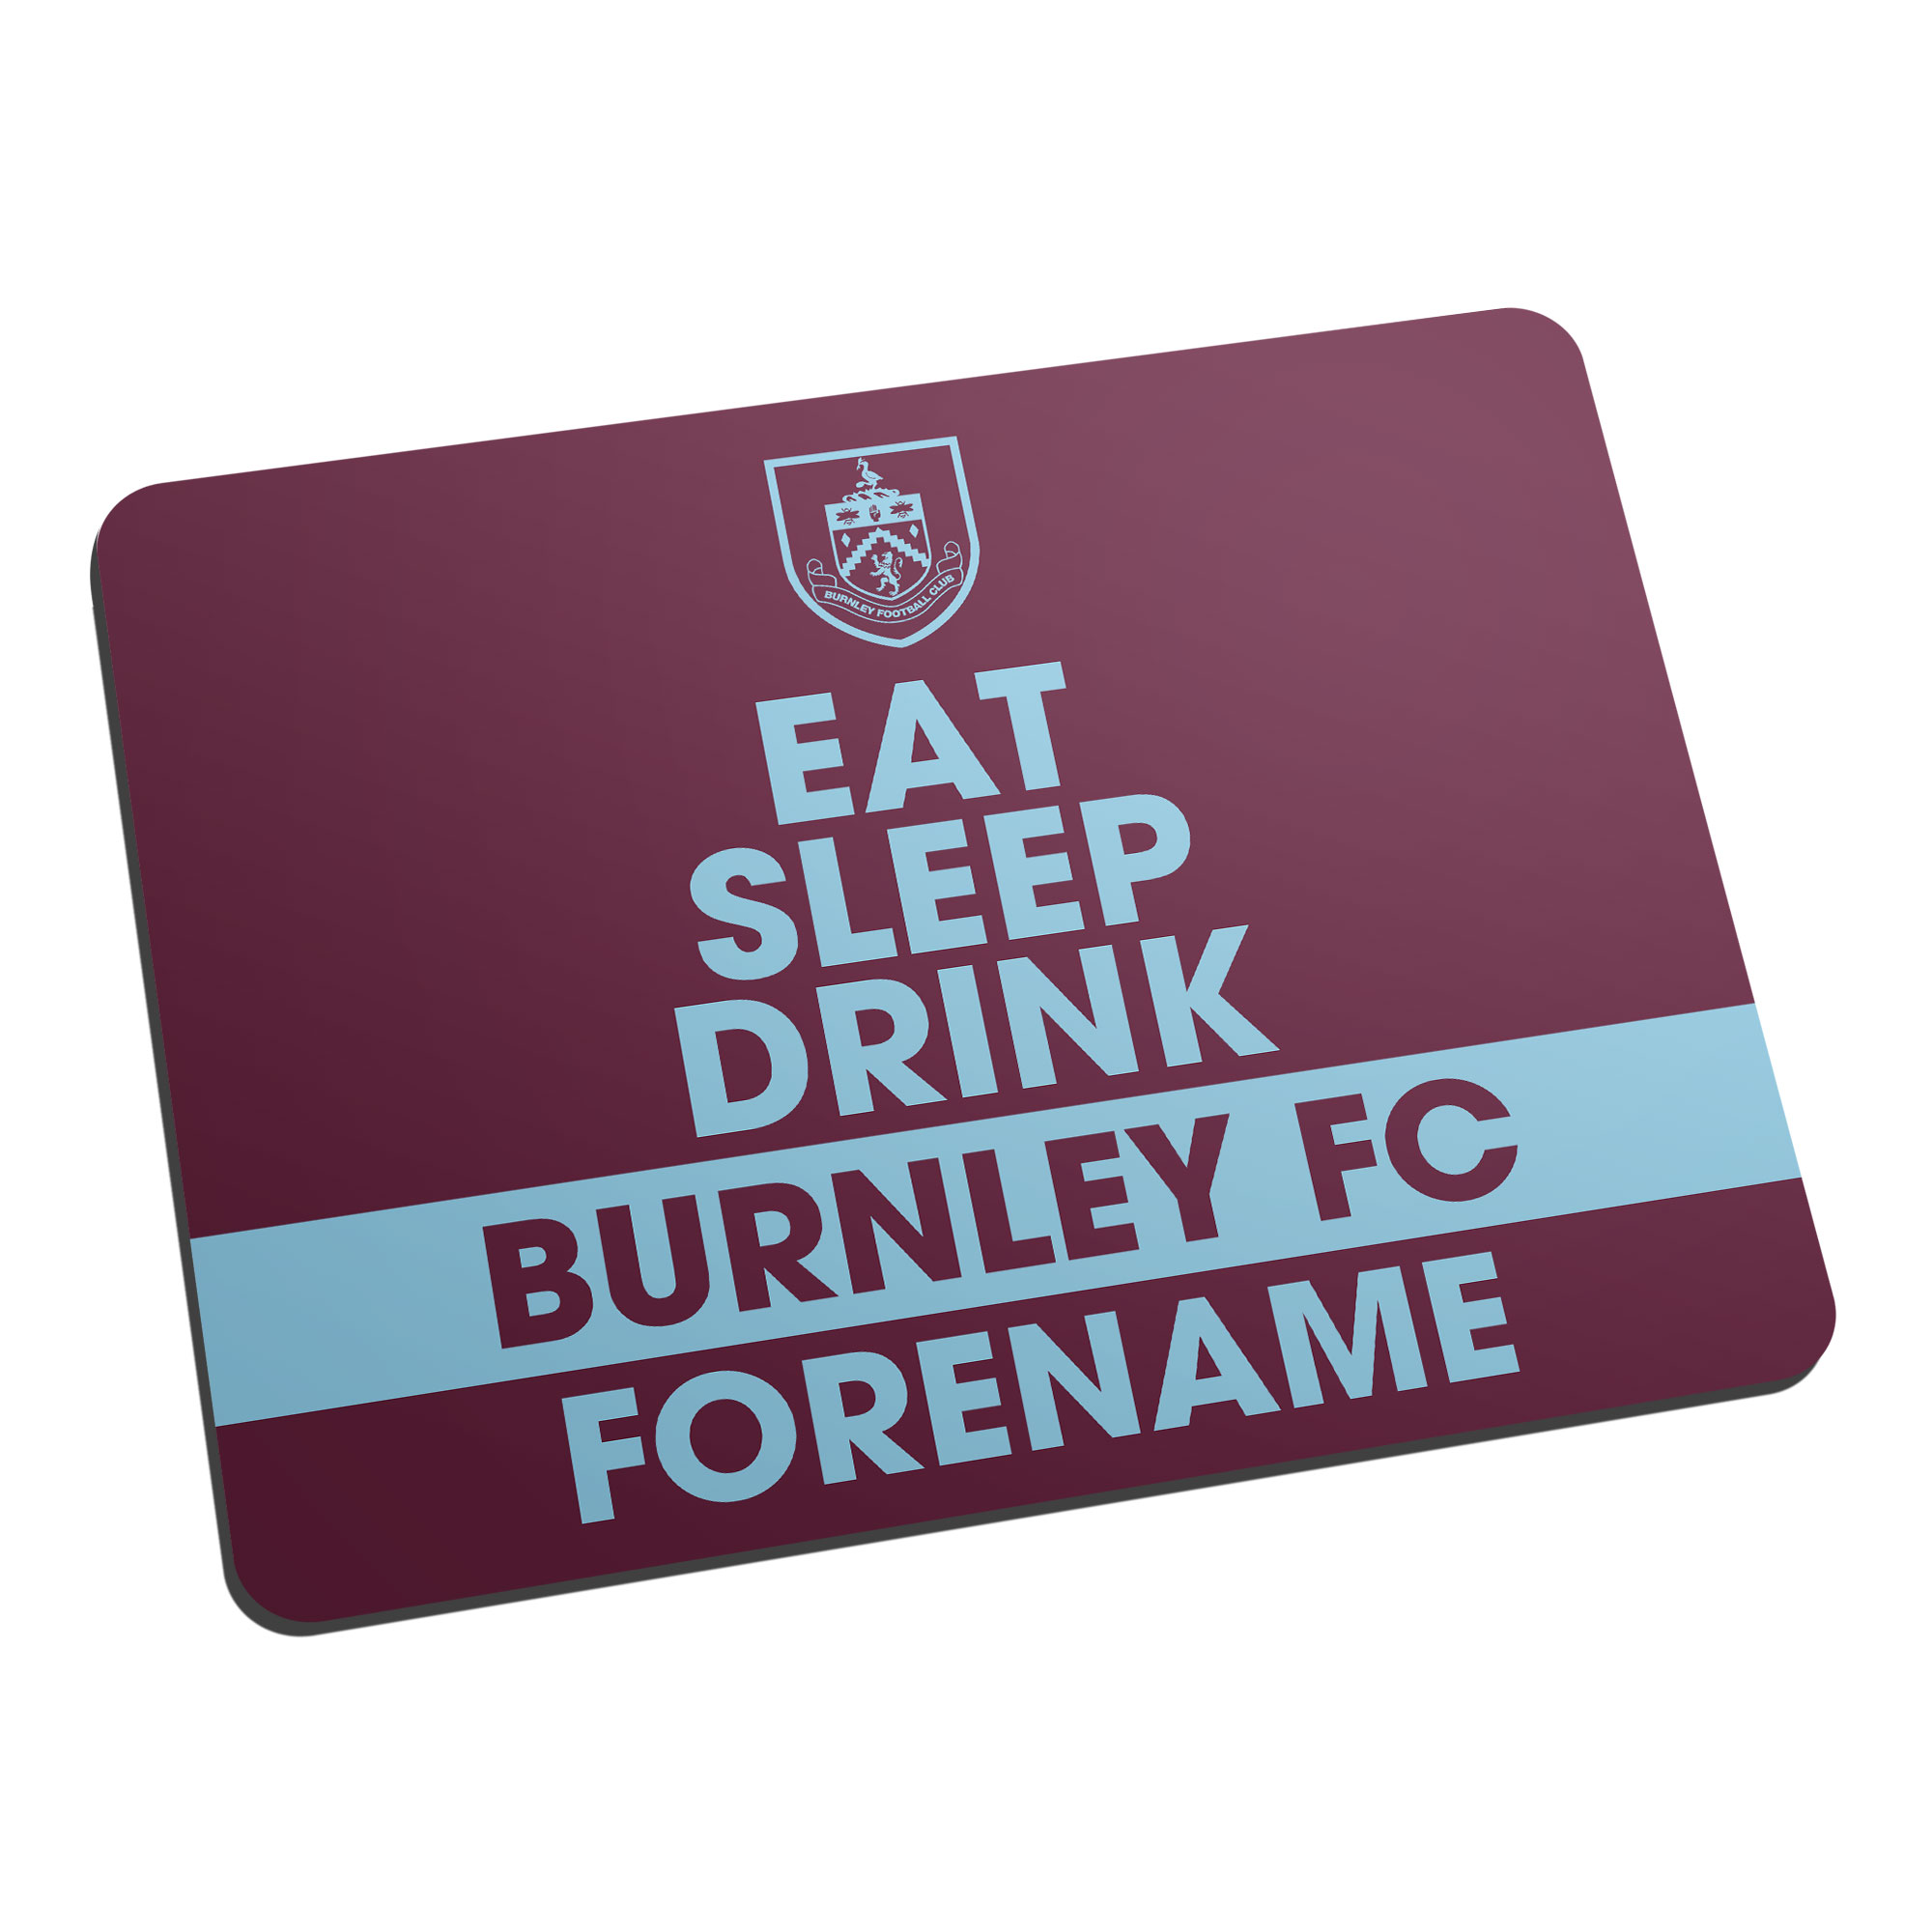 Burnley FC Eat Sleep Drink Mouse Mat